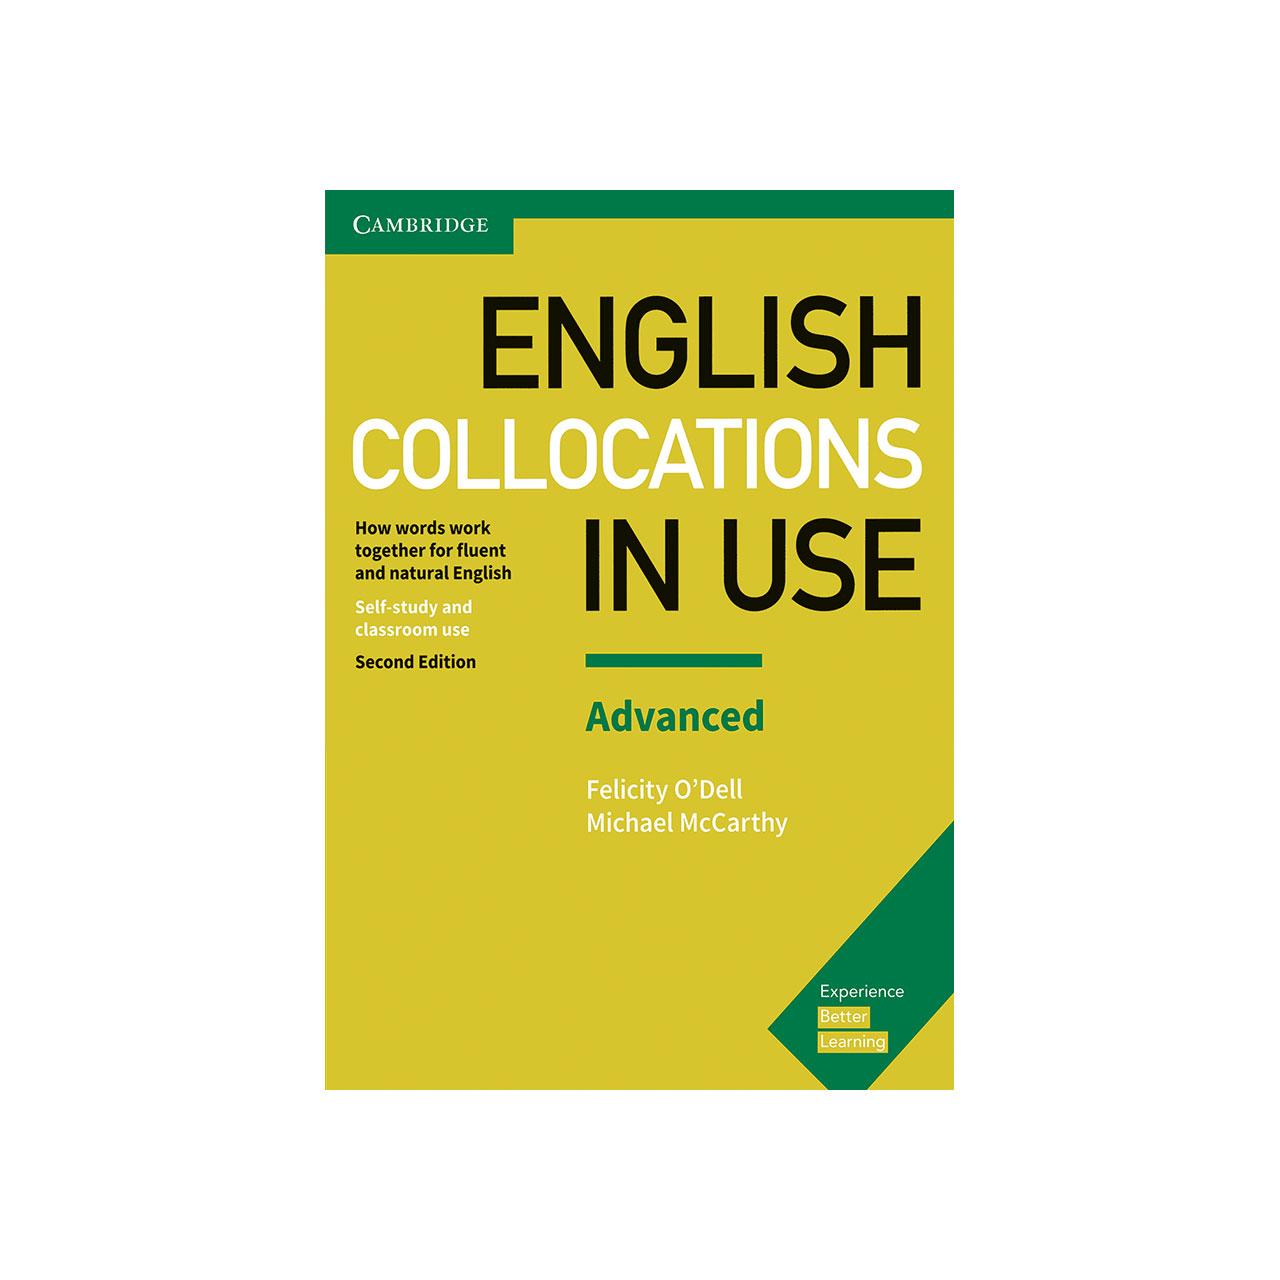 کتاب زبان Collocations in Use English 2nd Advanced انتشارات جنگل